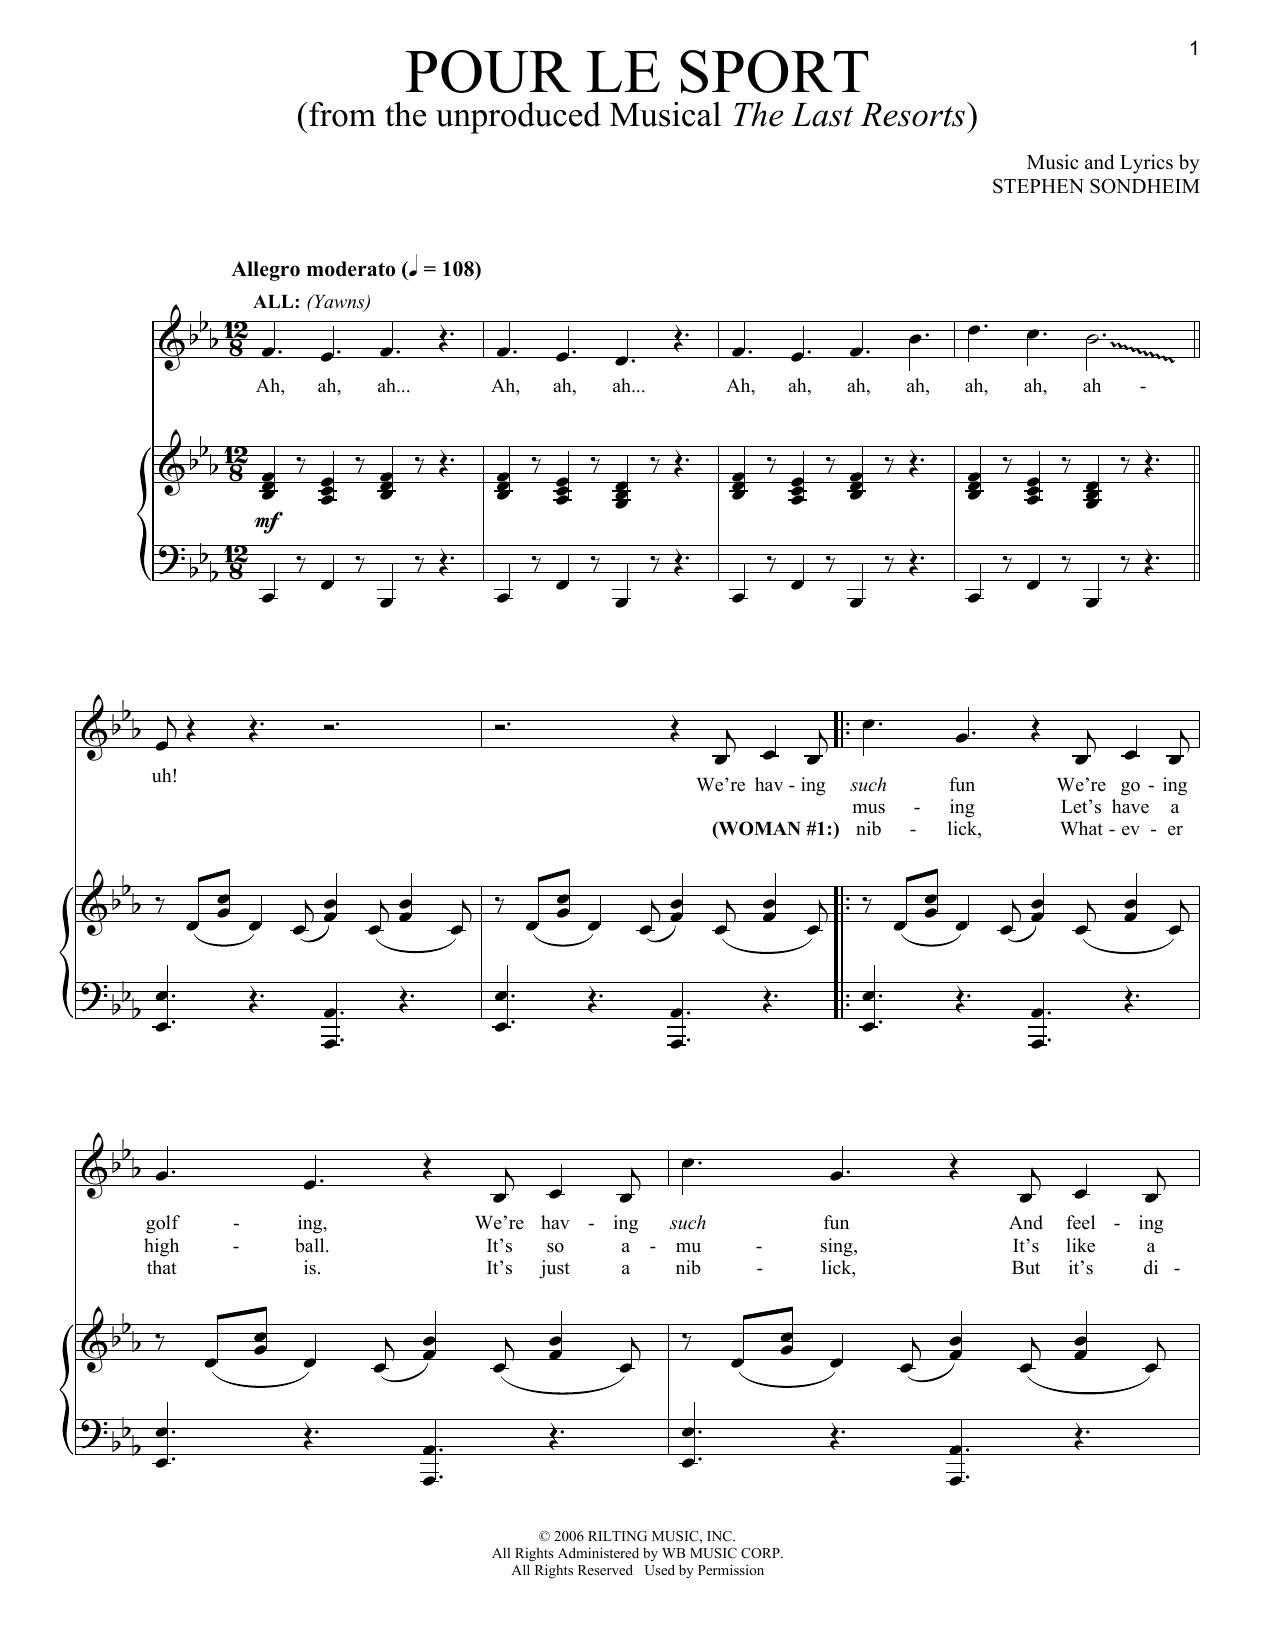 Stephen Sondheim Pour Le Sport sheet music notes and chords